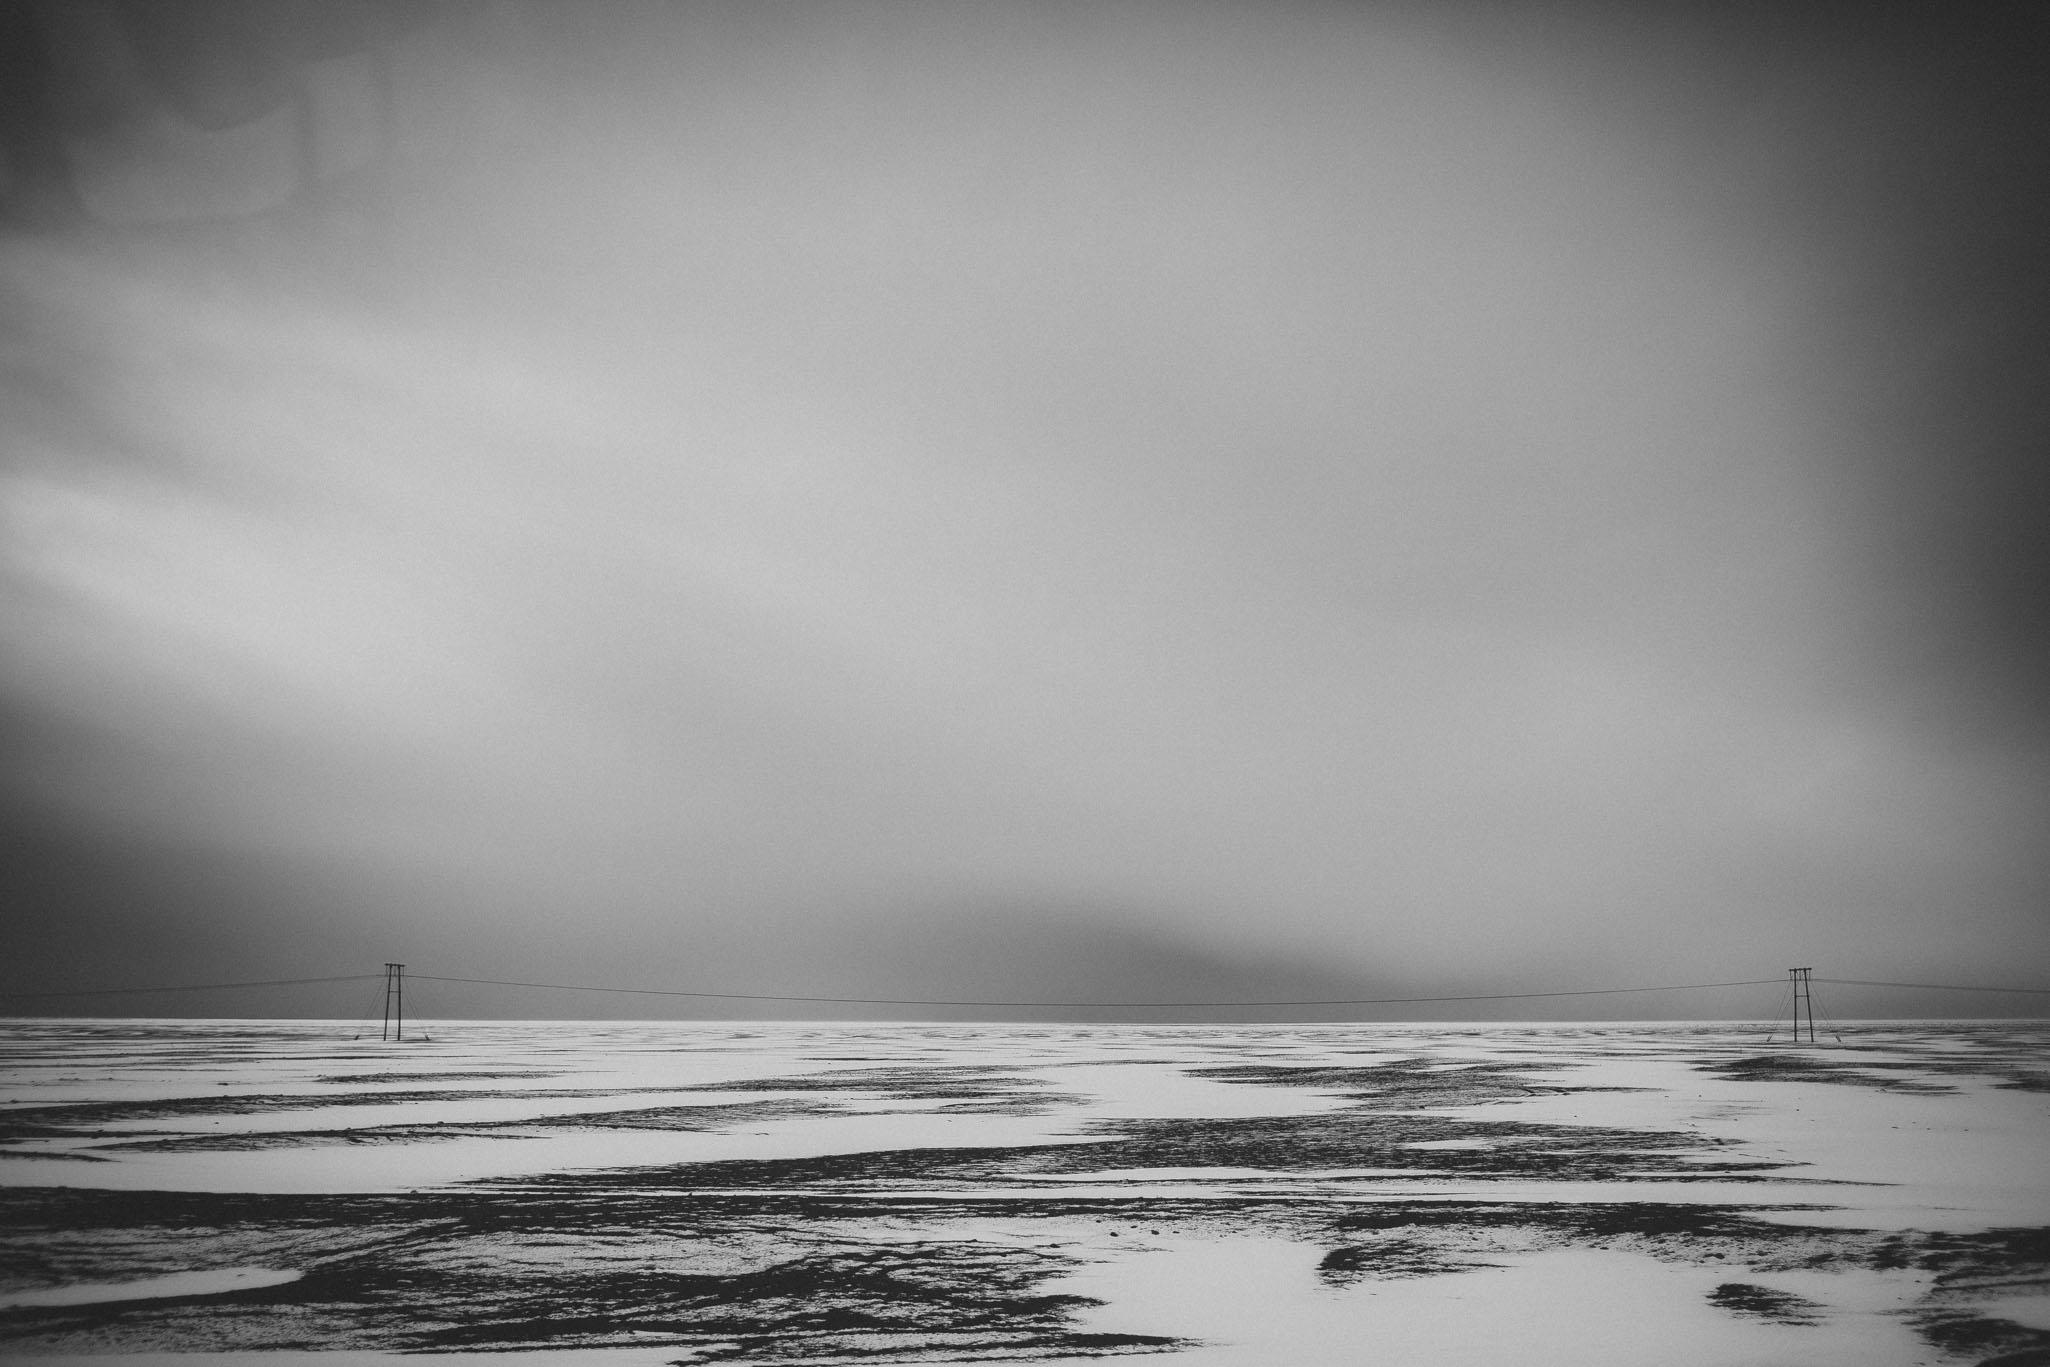 Road-trip-Islande-Iceland-Voyage-Travel-Portrait-Jérémy-Boyer-Skaftafell-21.jpg